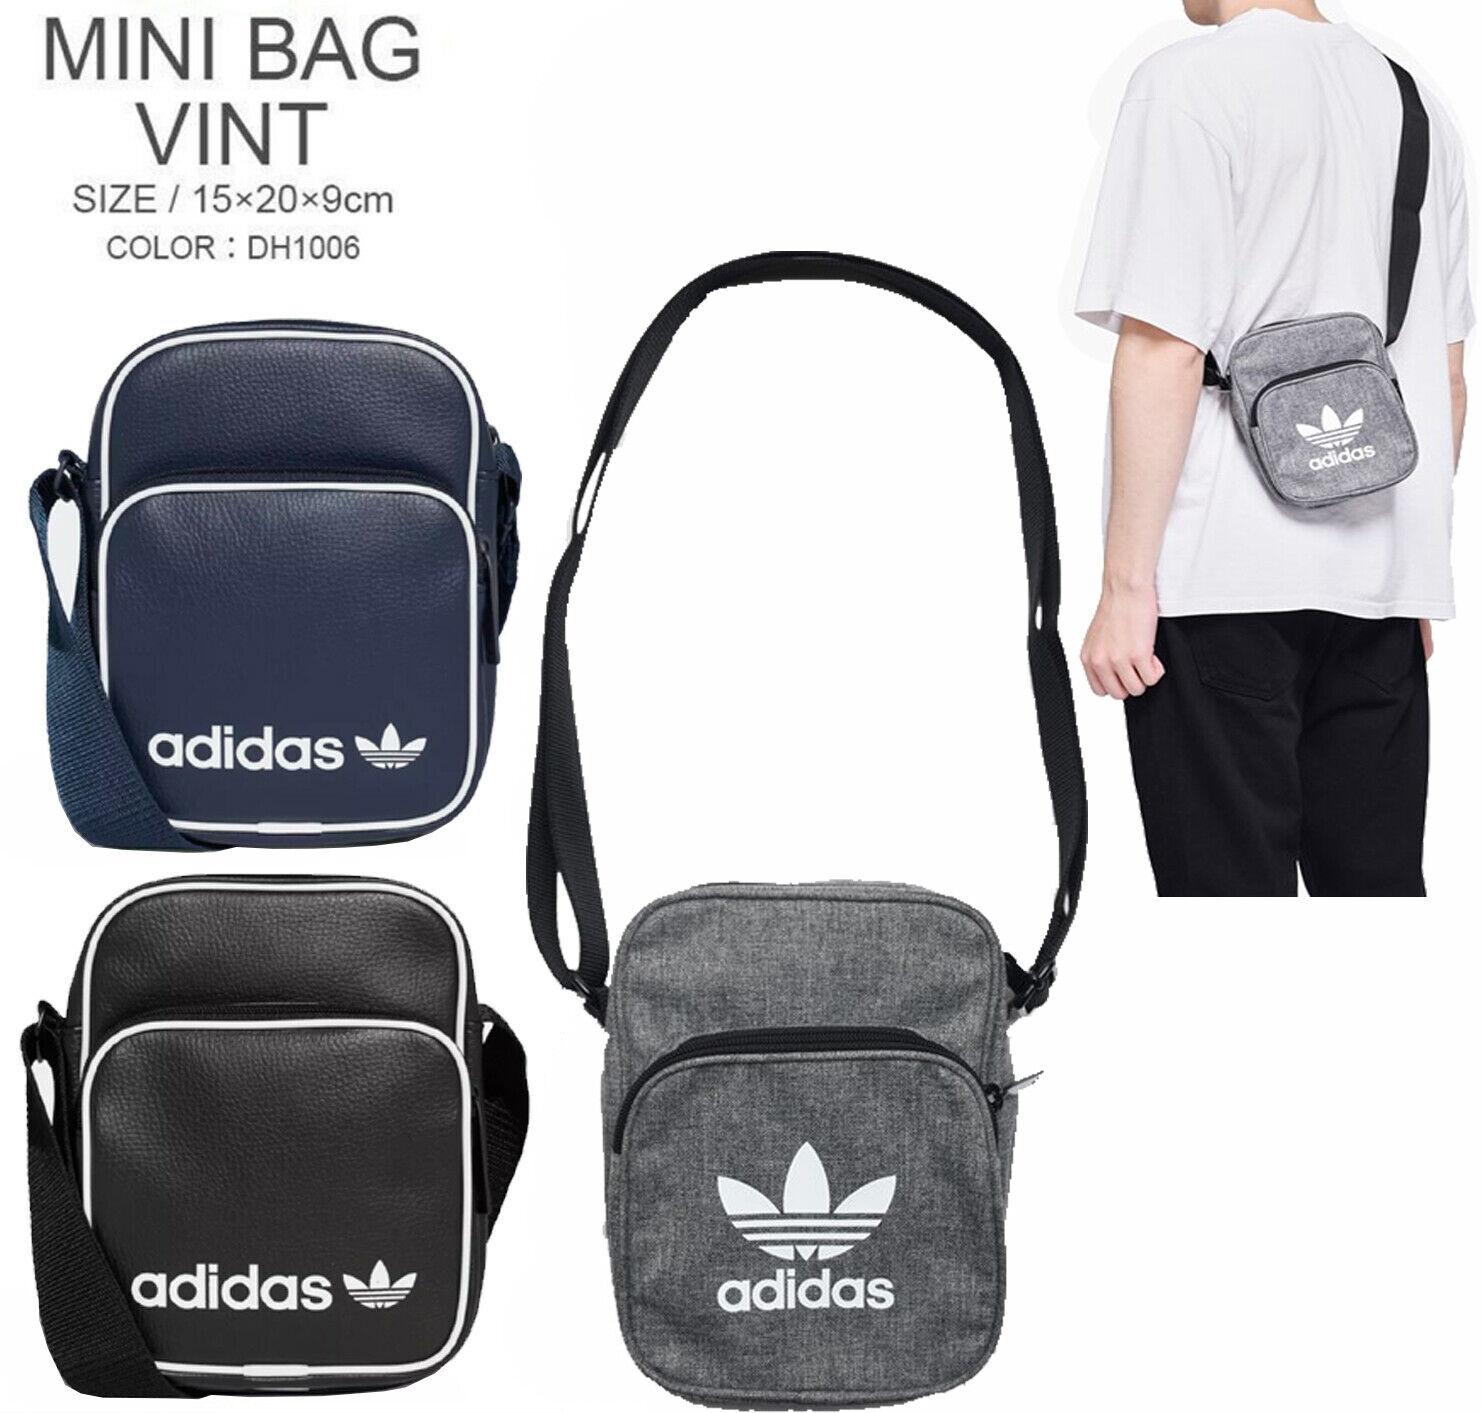 Adidas Originals School Bags - Mens Boys Girls Adidas Mini B